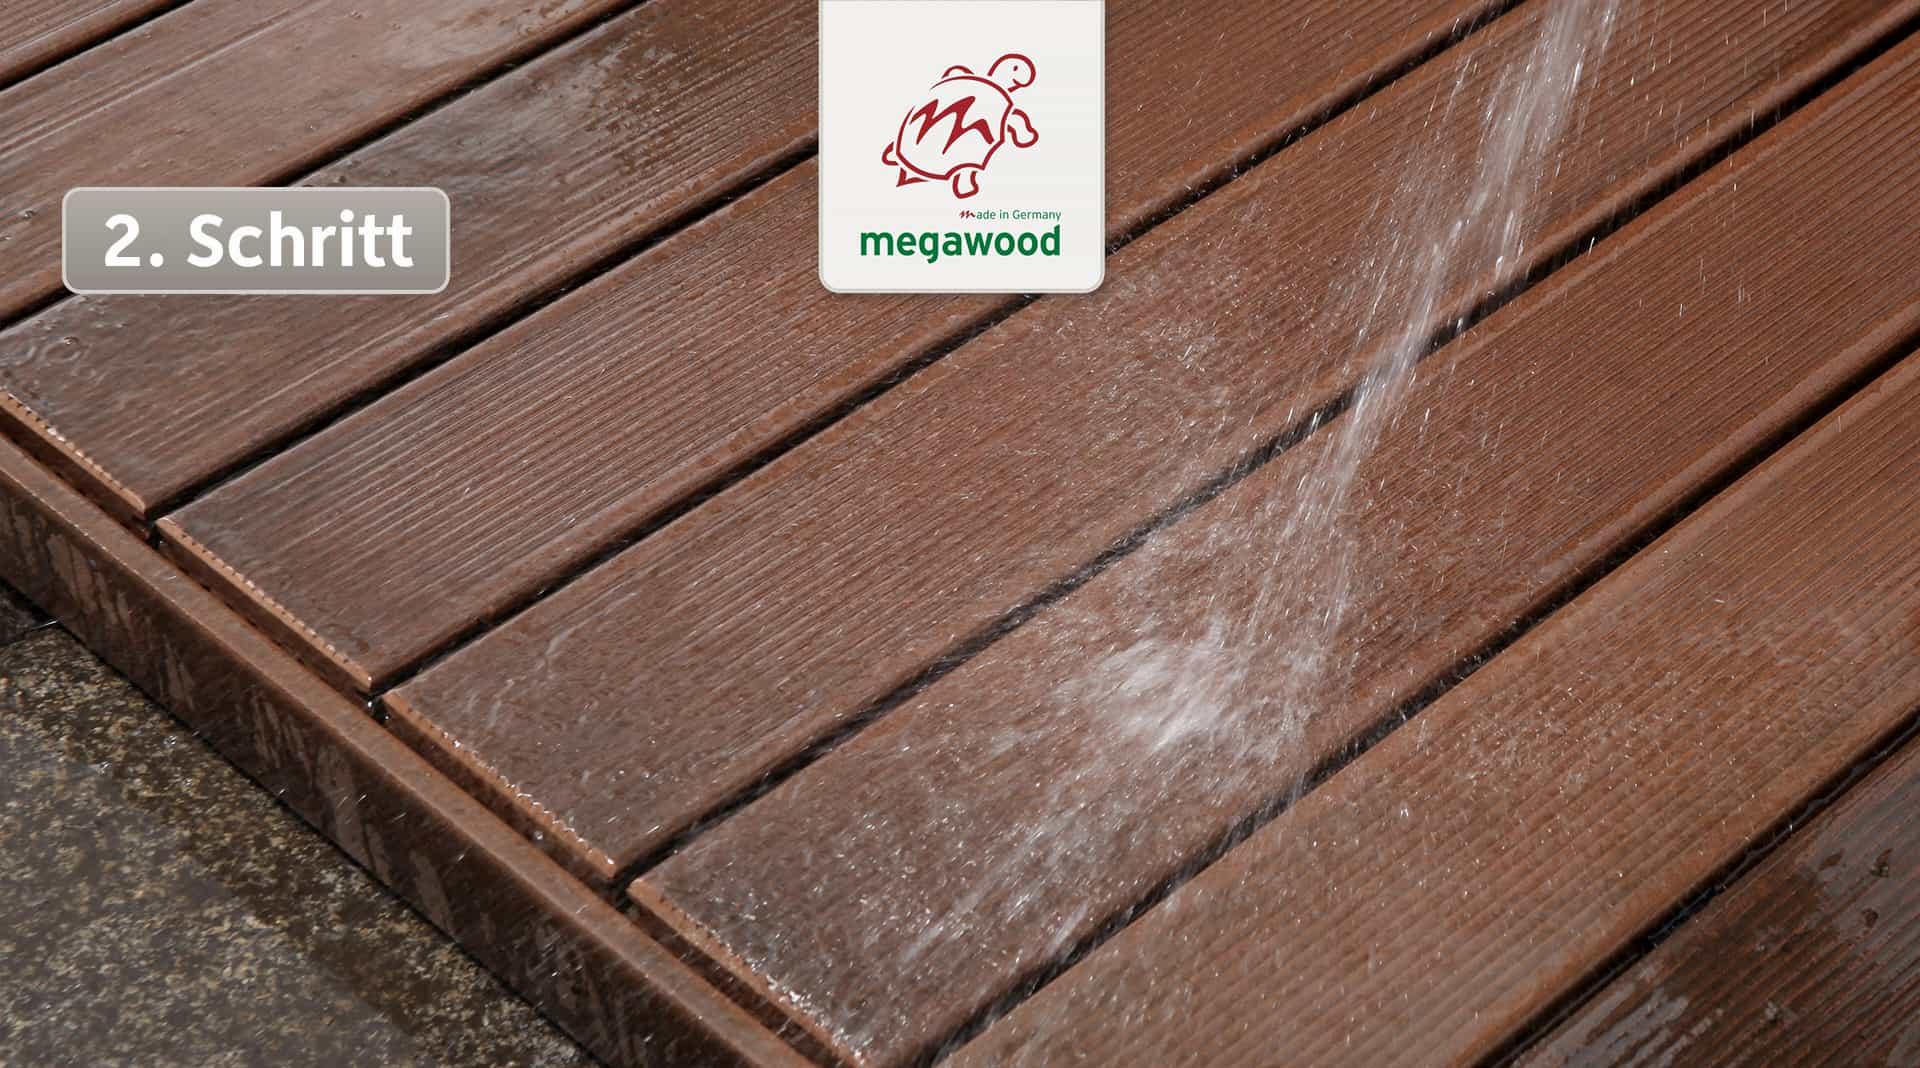 Wpc Dielen Megawood megawood terrassensystem pflege